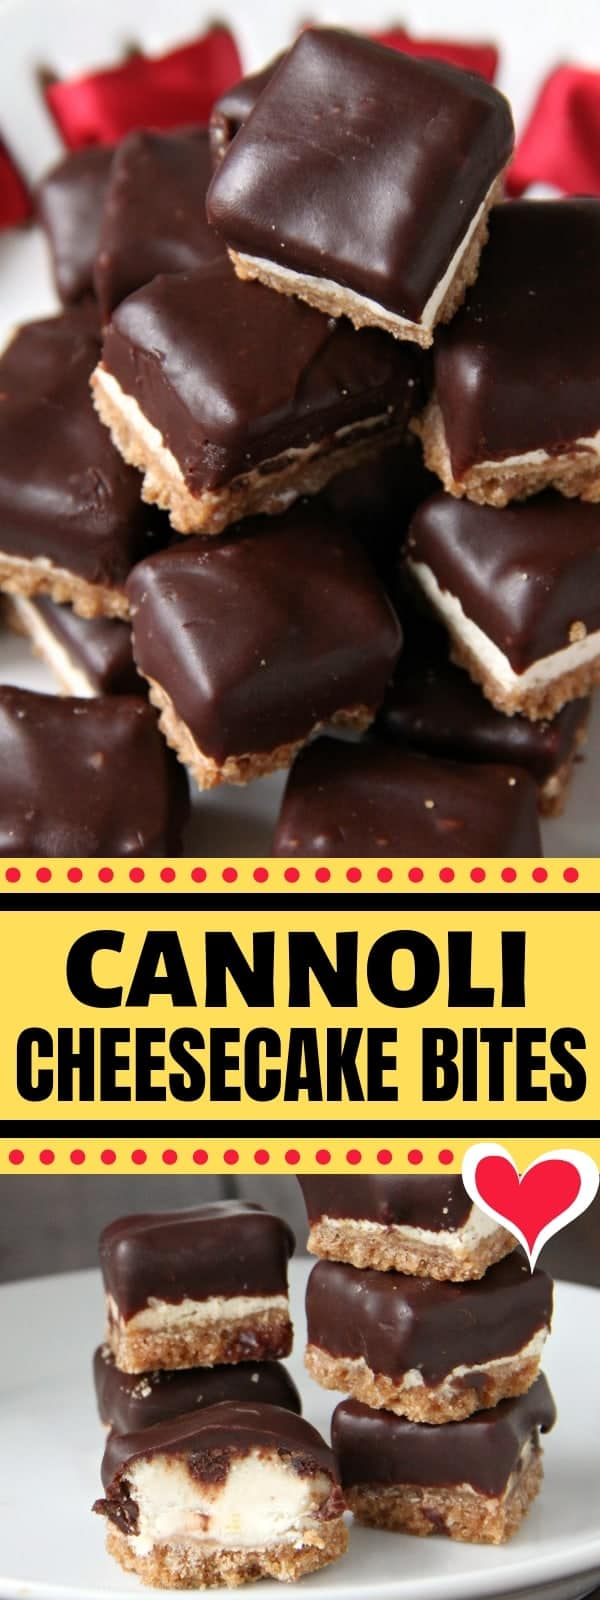 Cannoli Cheesecake Bites pin collage